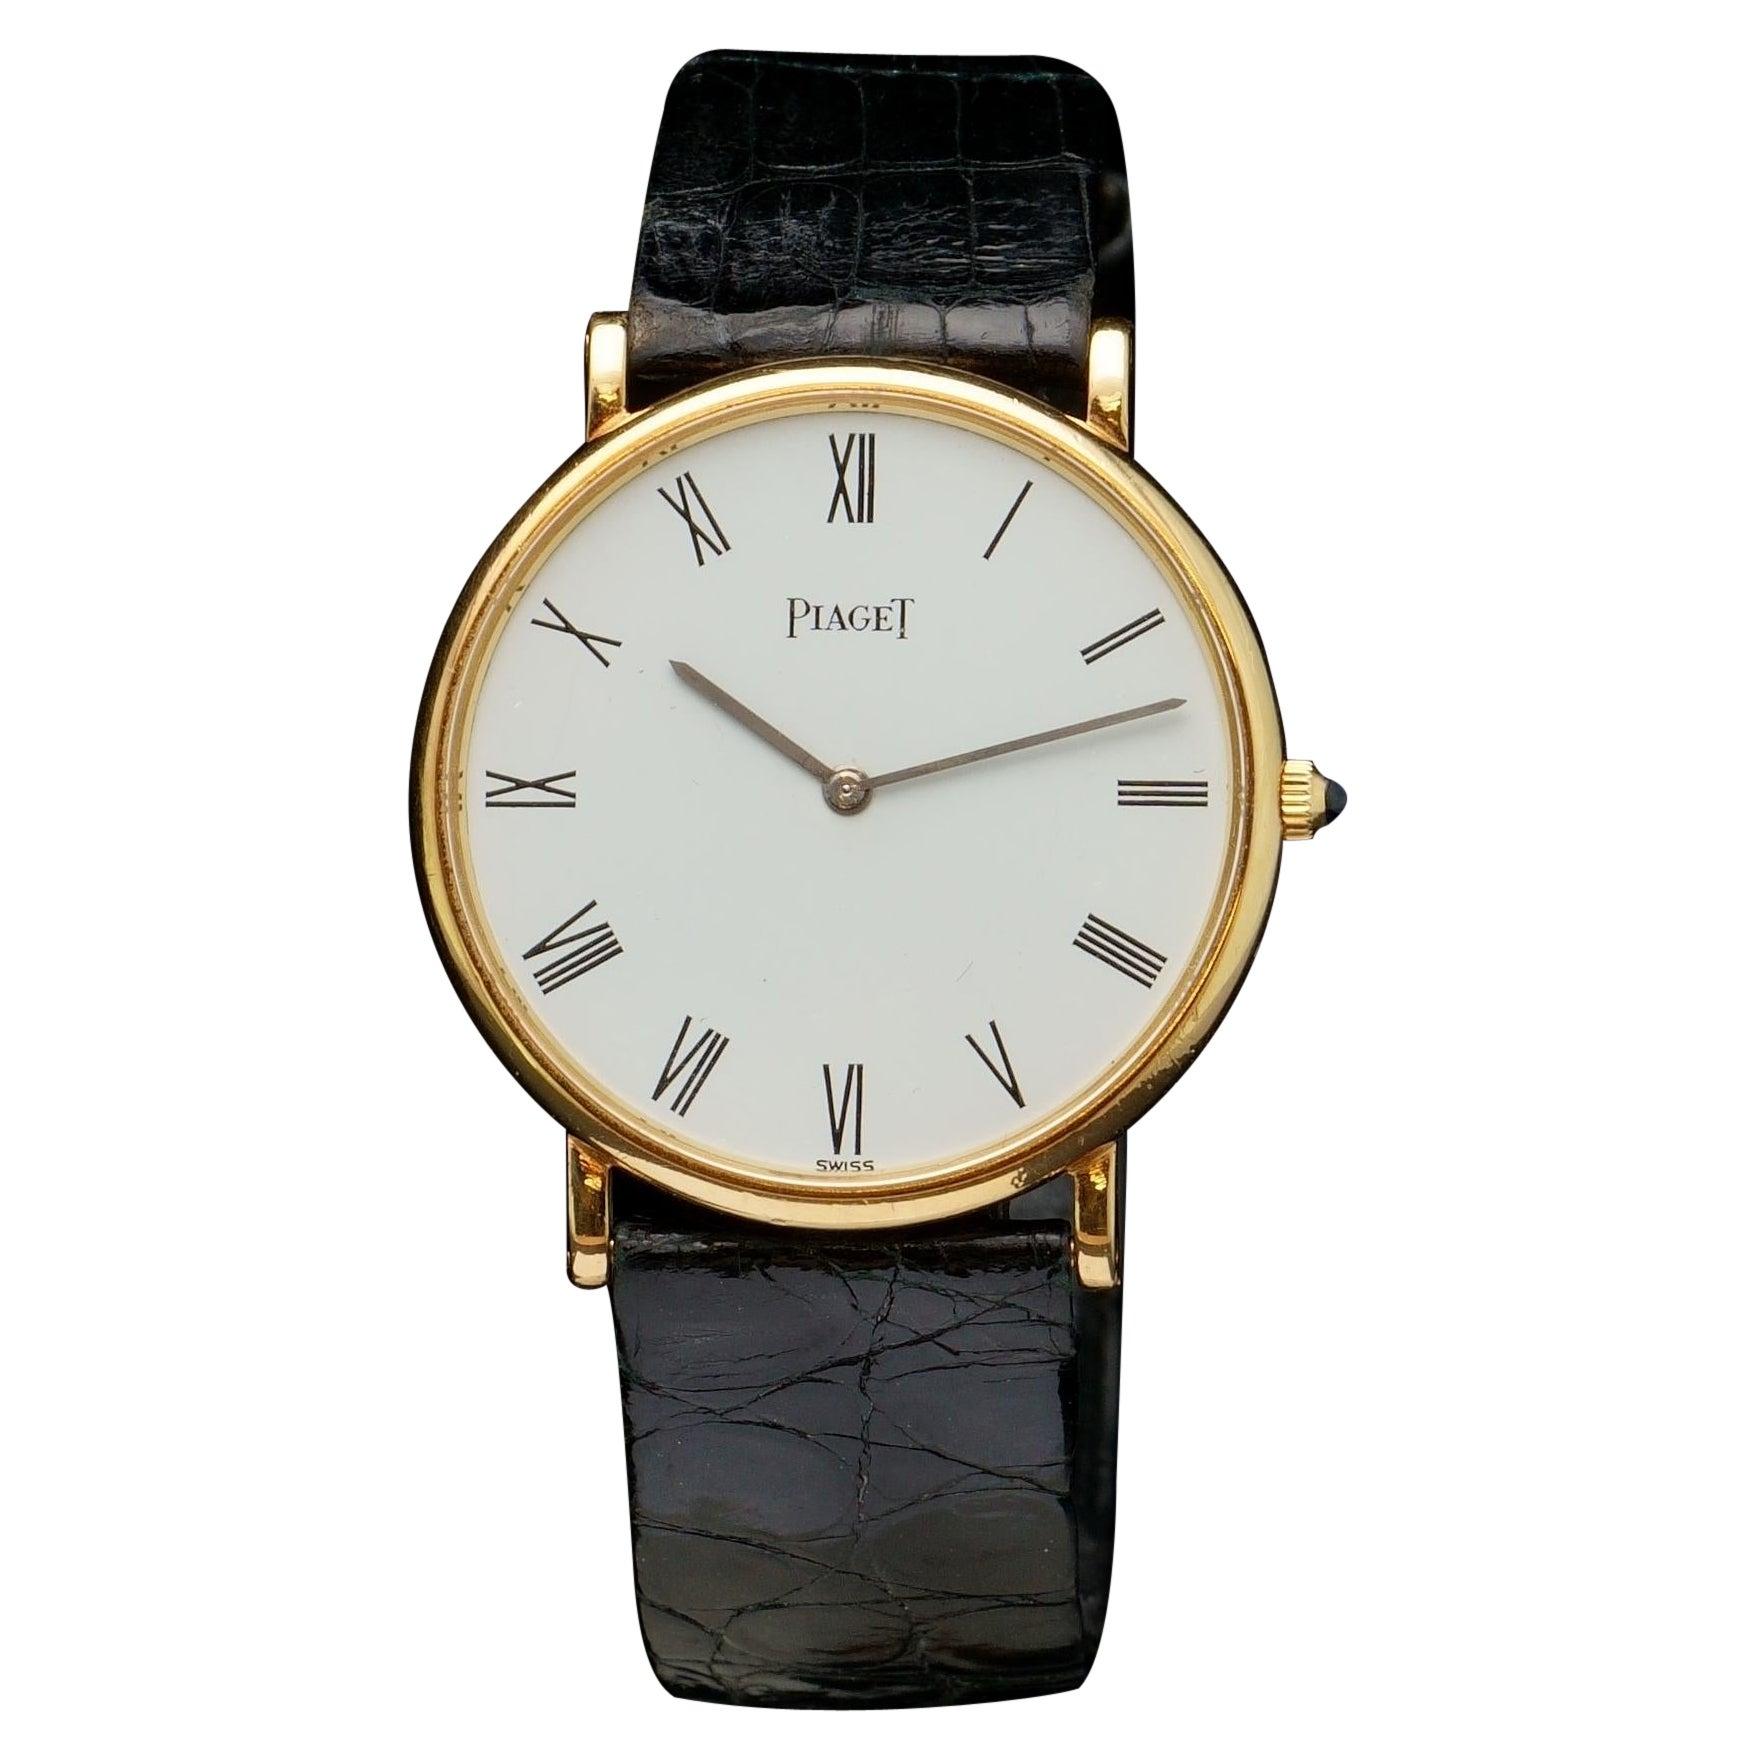 Piaget Classique 18kt Gold Manual Winding Wristwatch